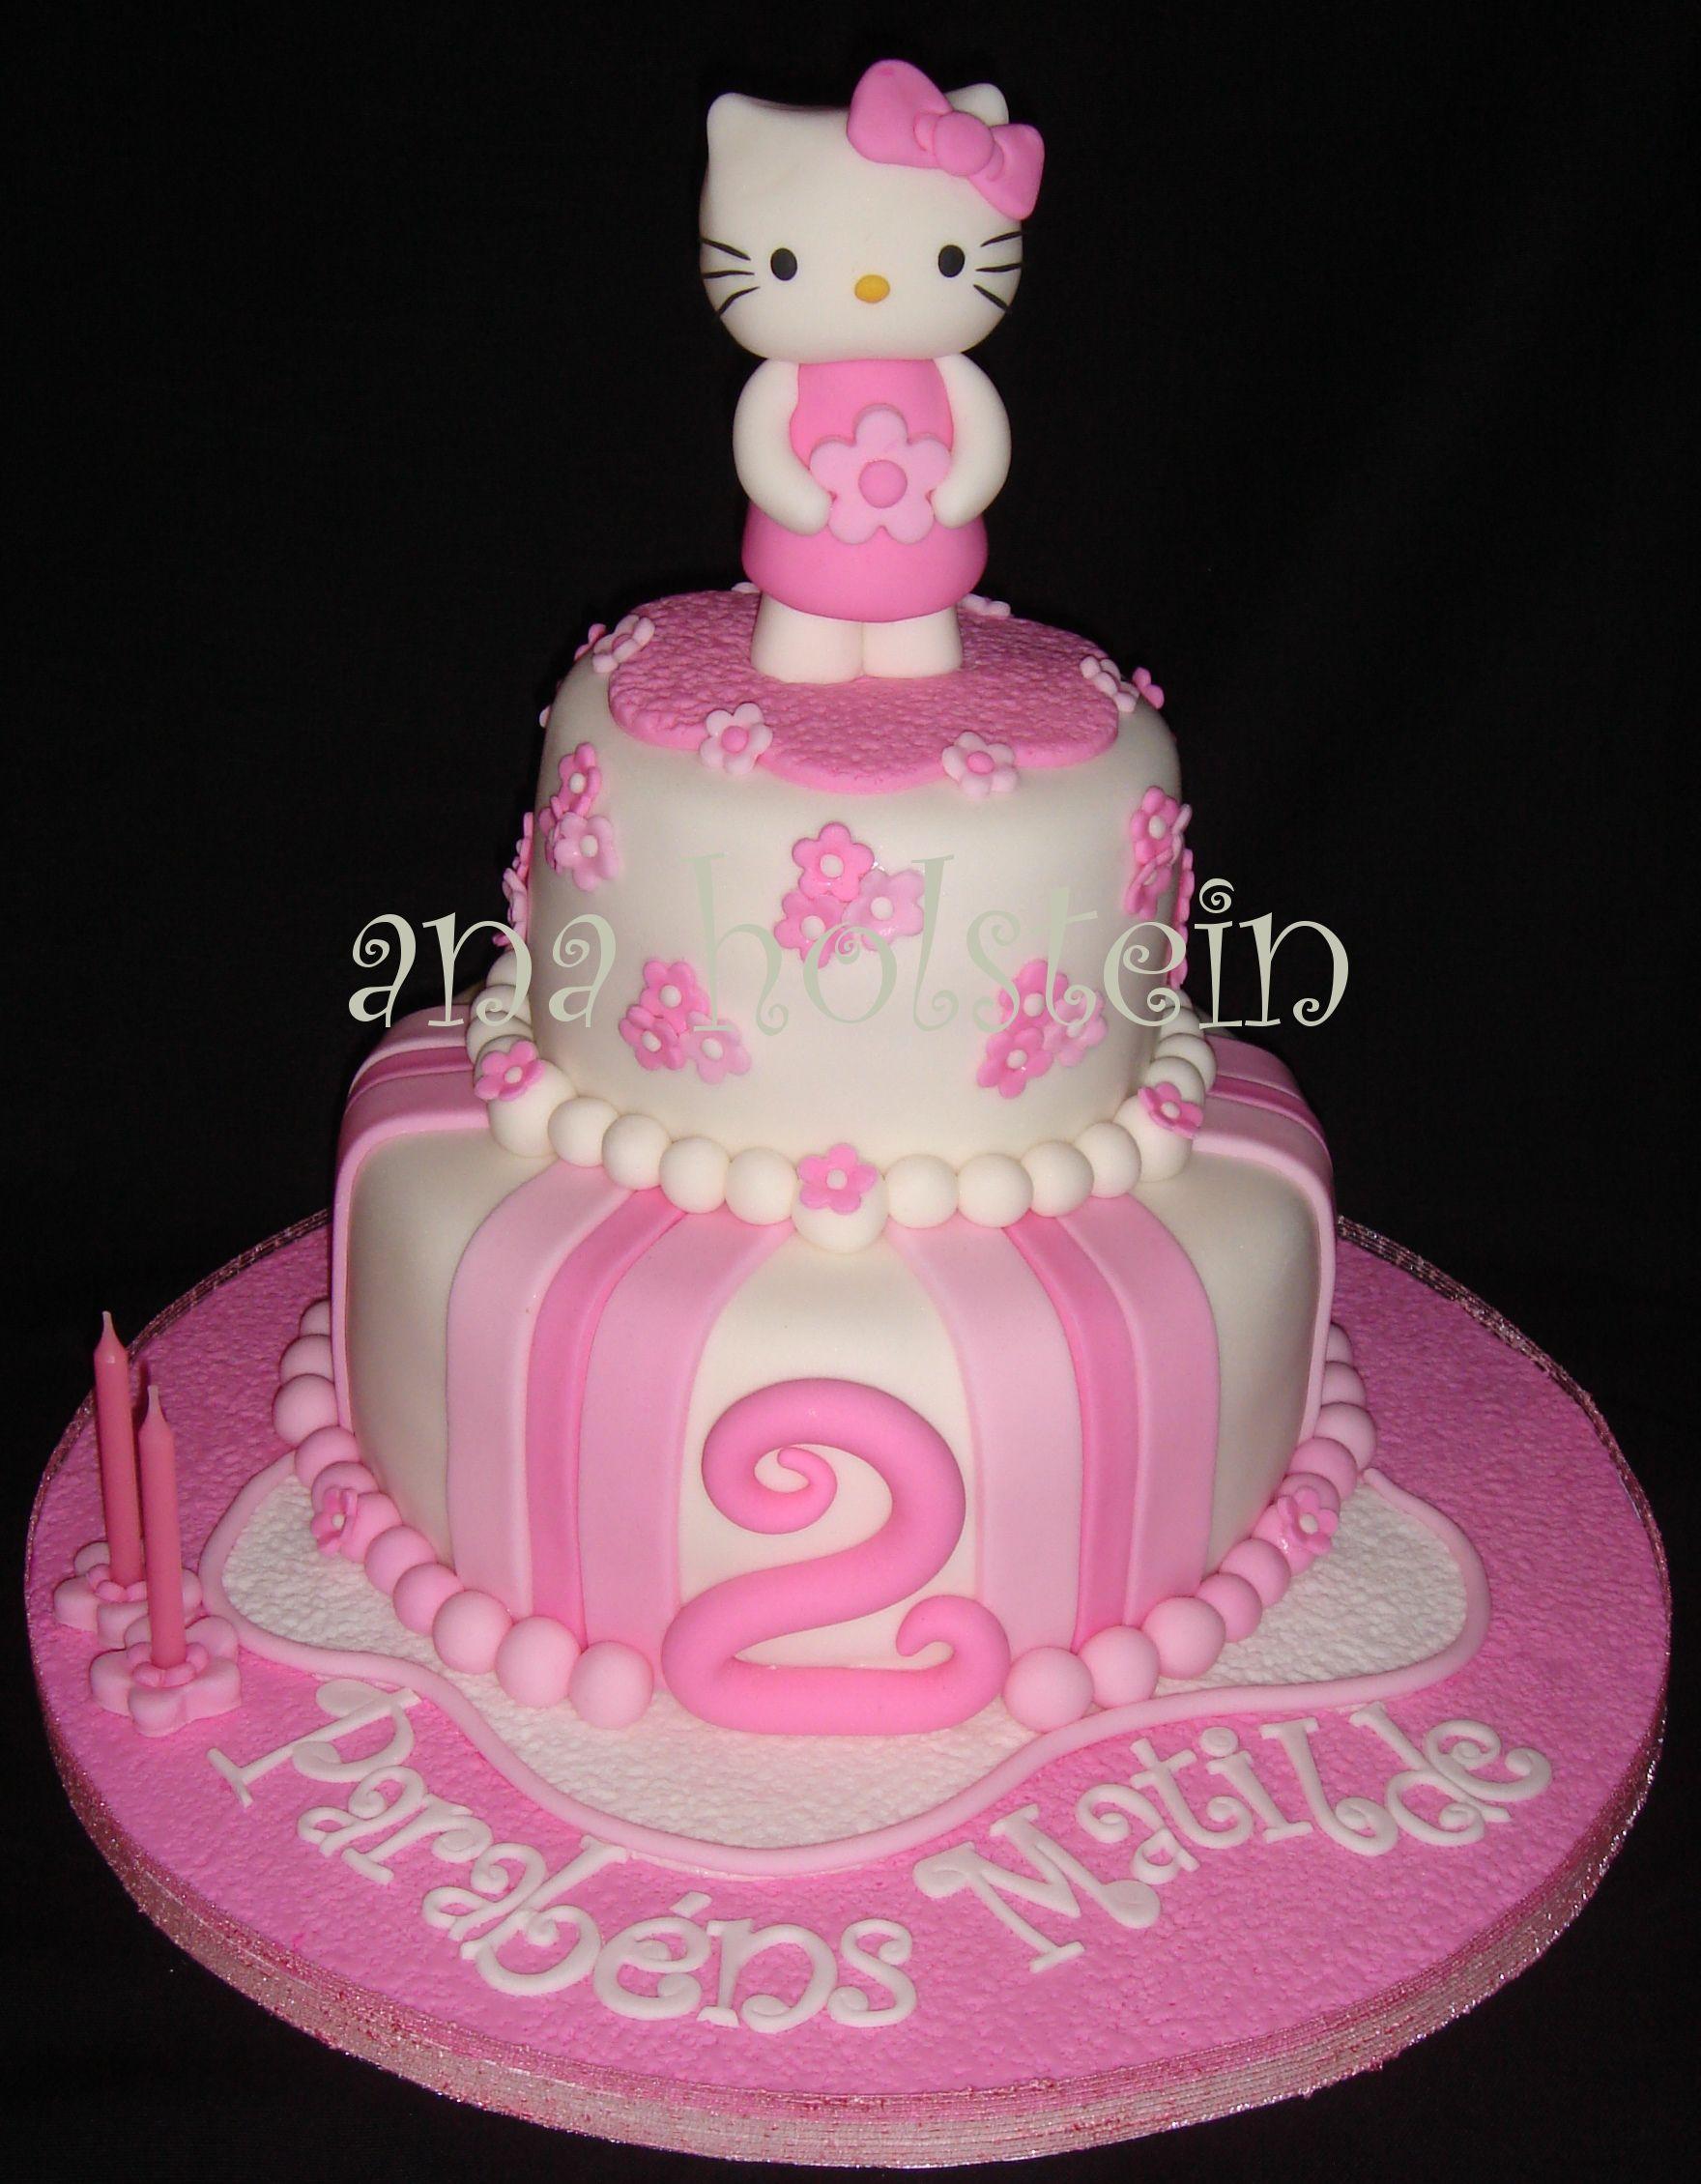 Fabulous Snoopy Birthday Cake Ideas And Designs